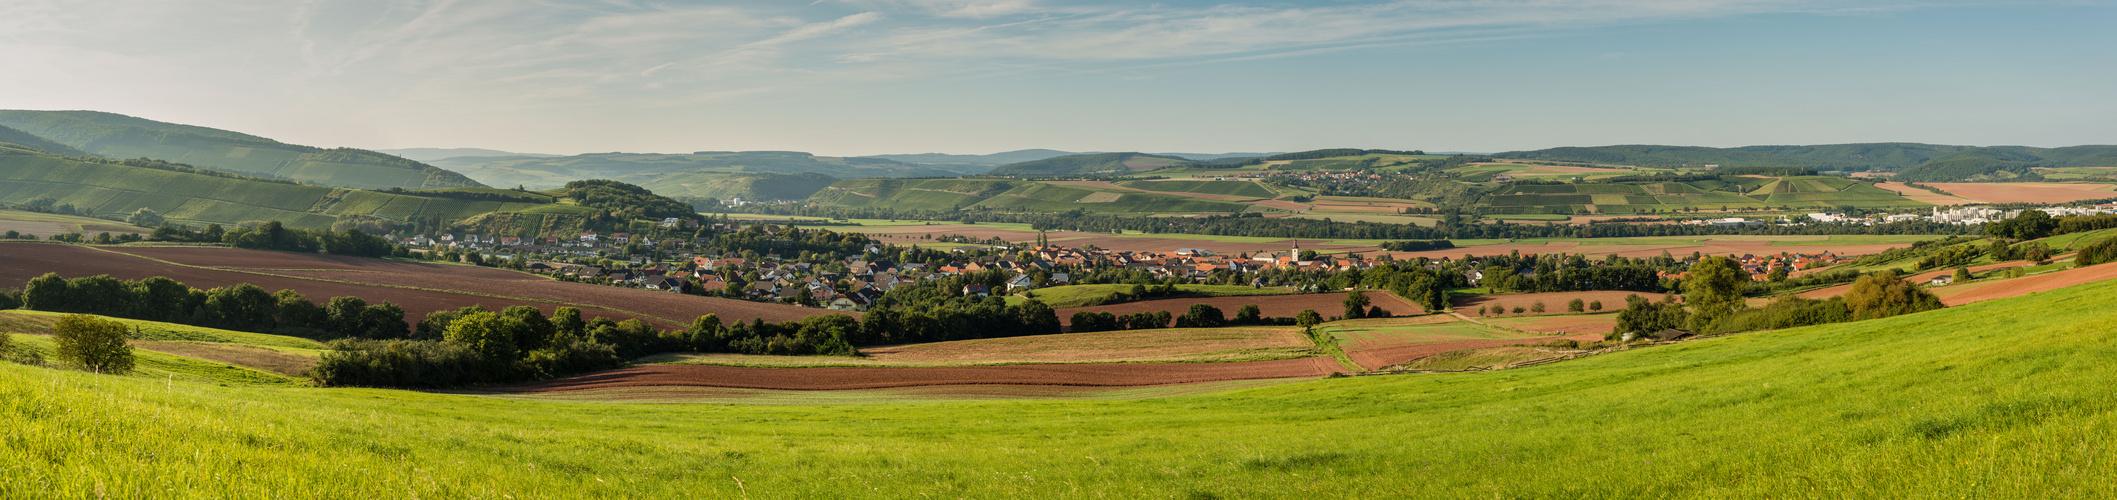 Panorama Meddersheim (4)